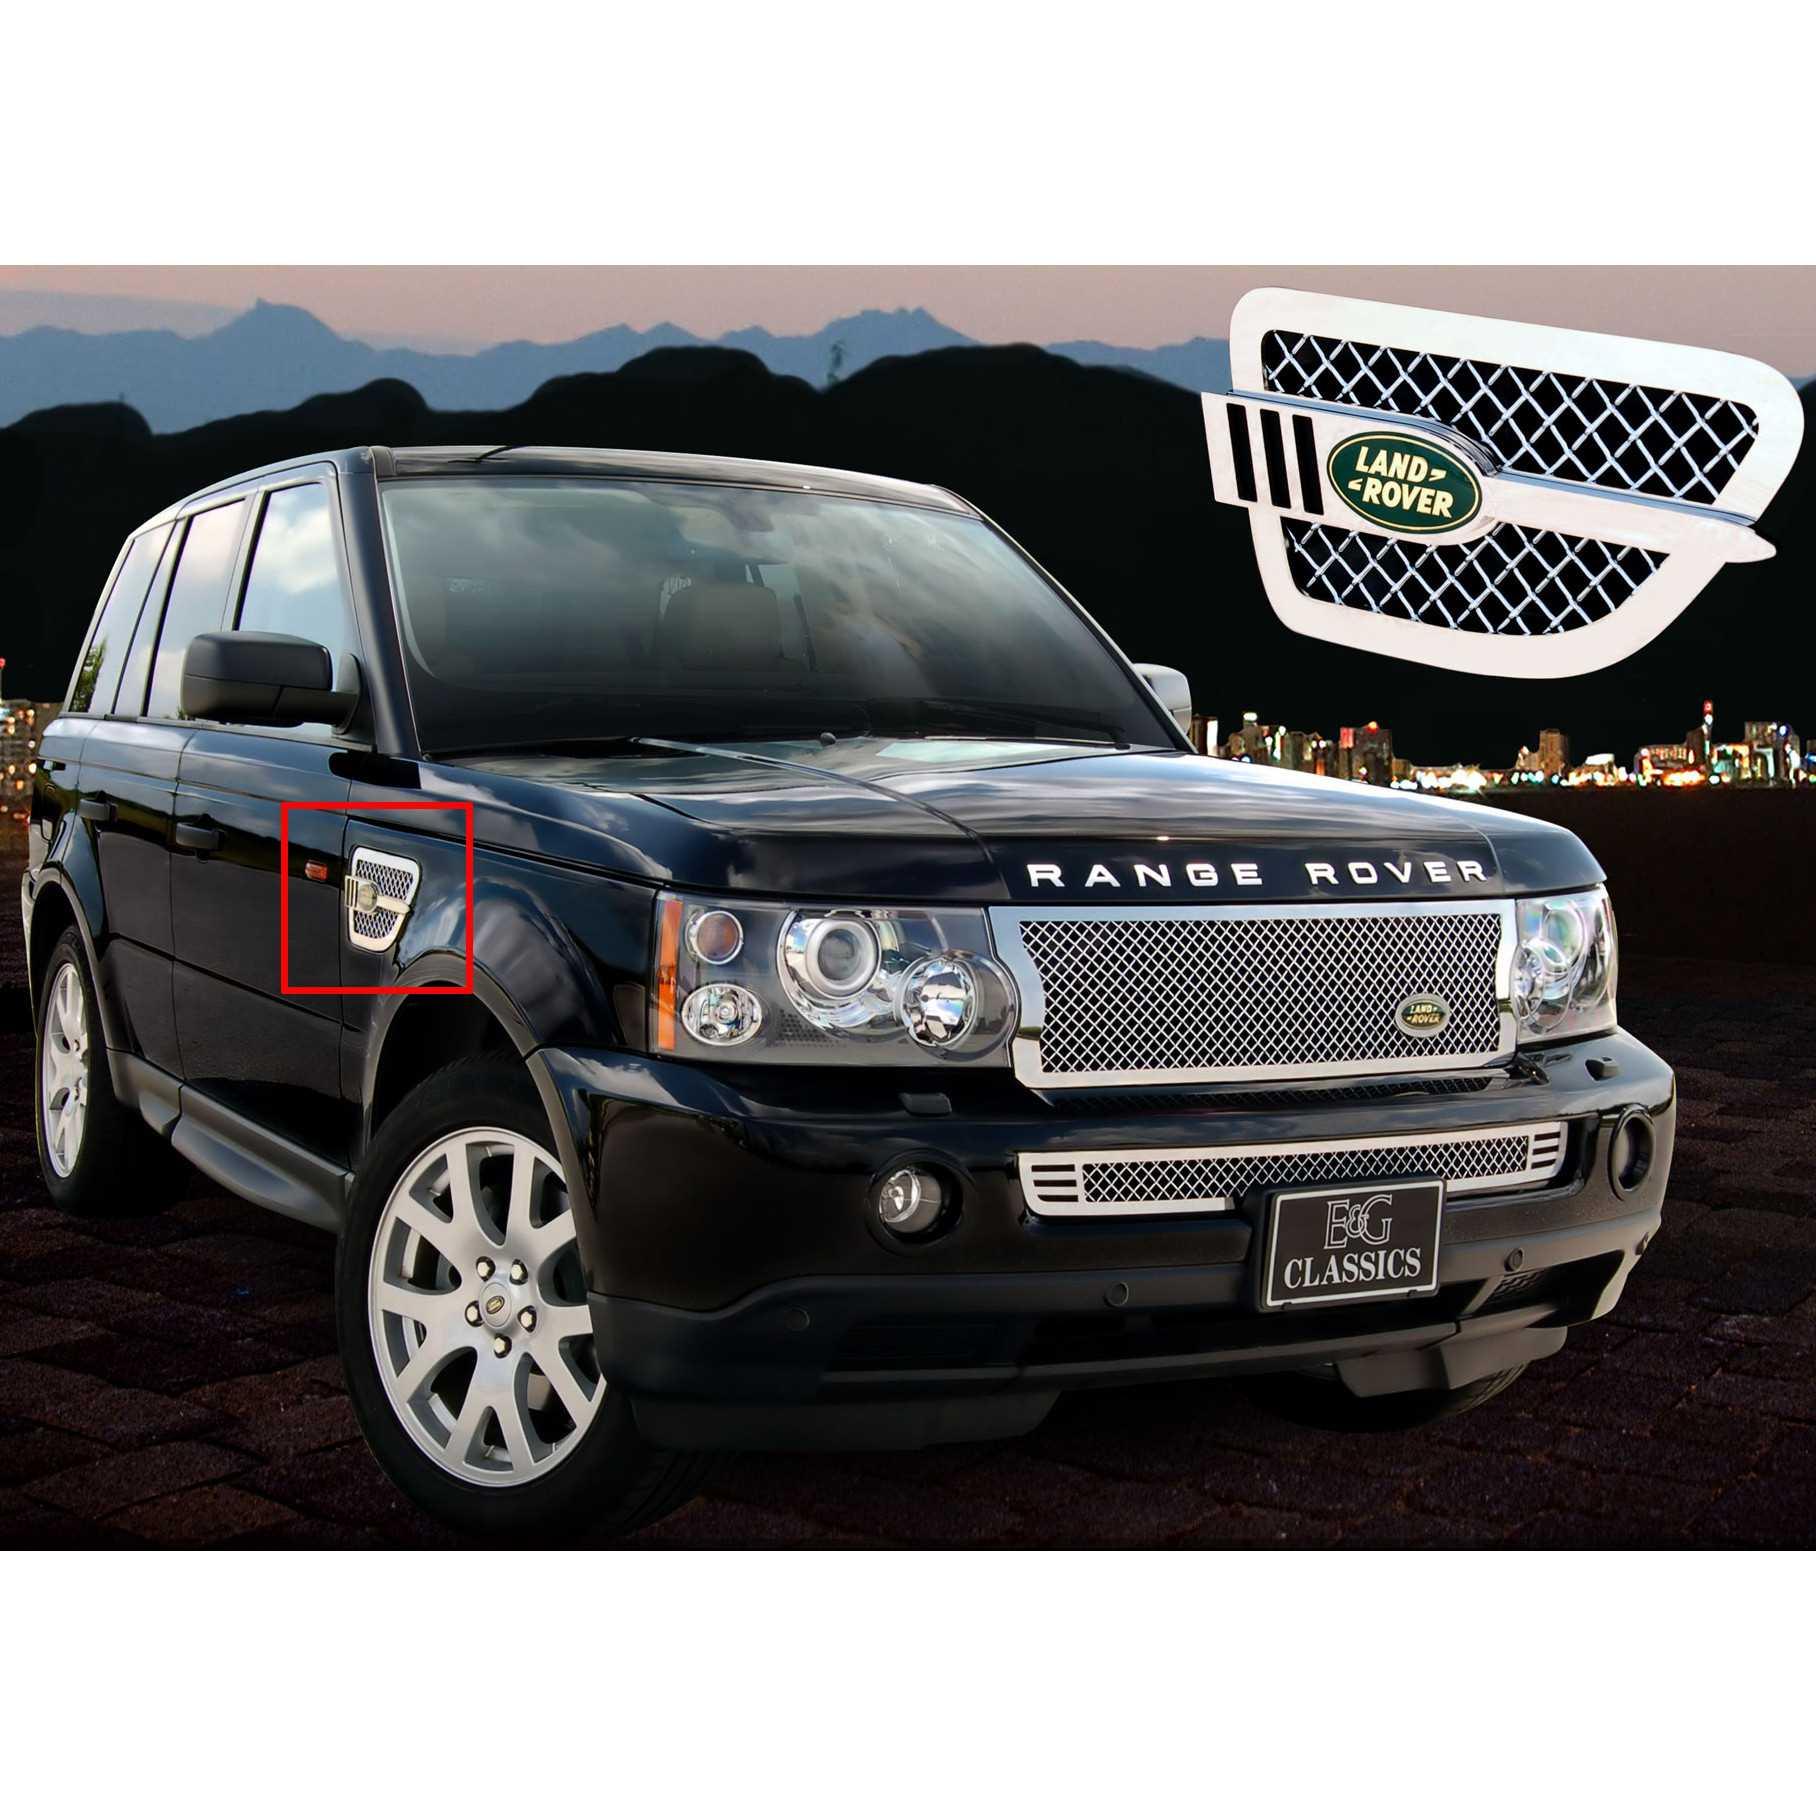 100 Sale Red Mini R U0026g 100 100 Kawasaki Ninja 650  : Land Rover Range Rover Sport e and g chrome mesh fender vent set grille 1385 01XW 04 from oyuncacocuk.com size 1816 x 1816 jpeg 569kB